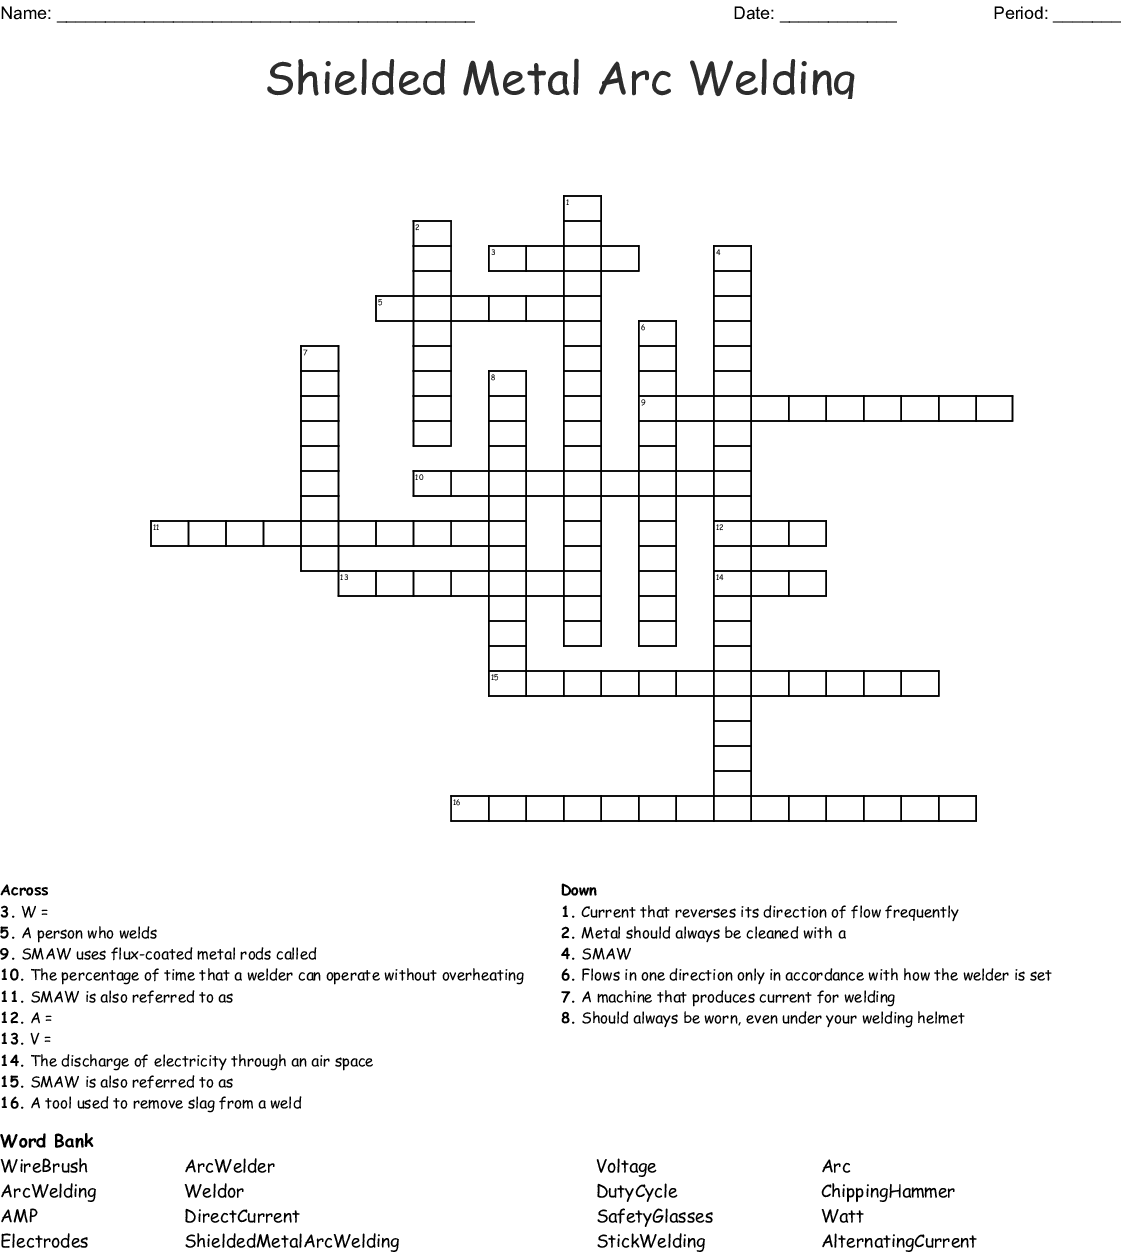 hight resolution of shielded metal arc welding crossword